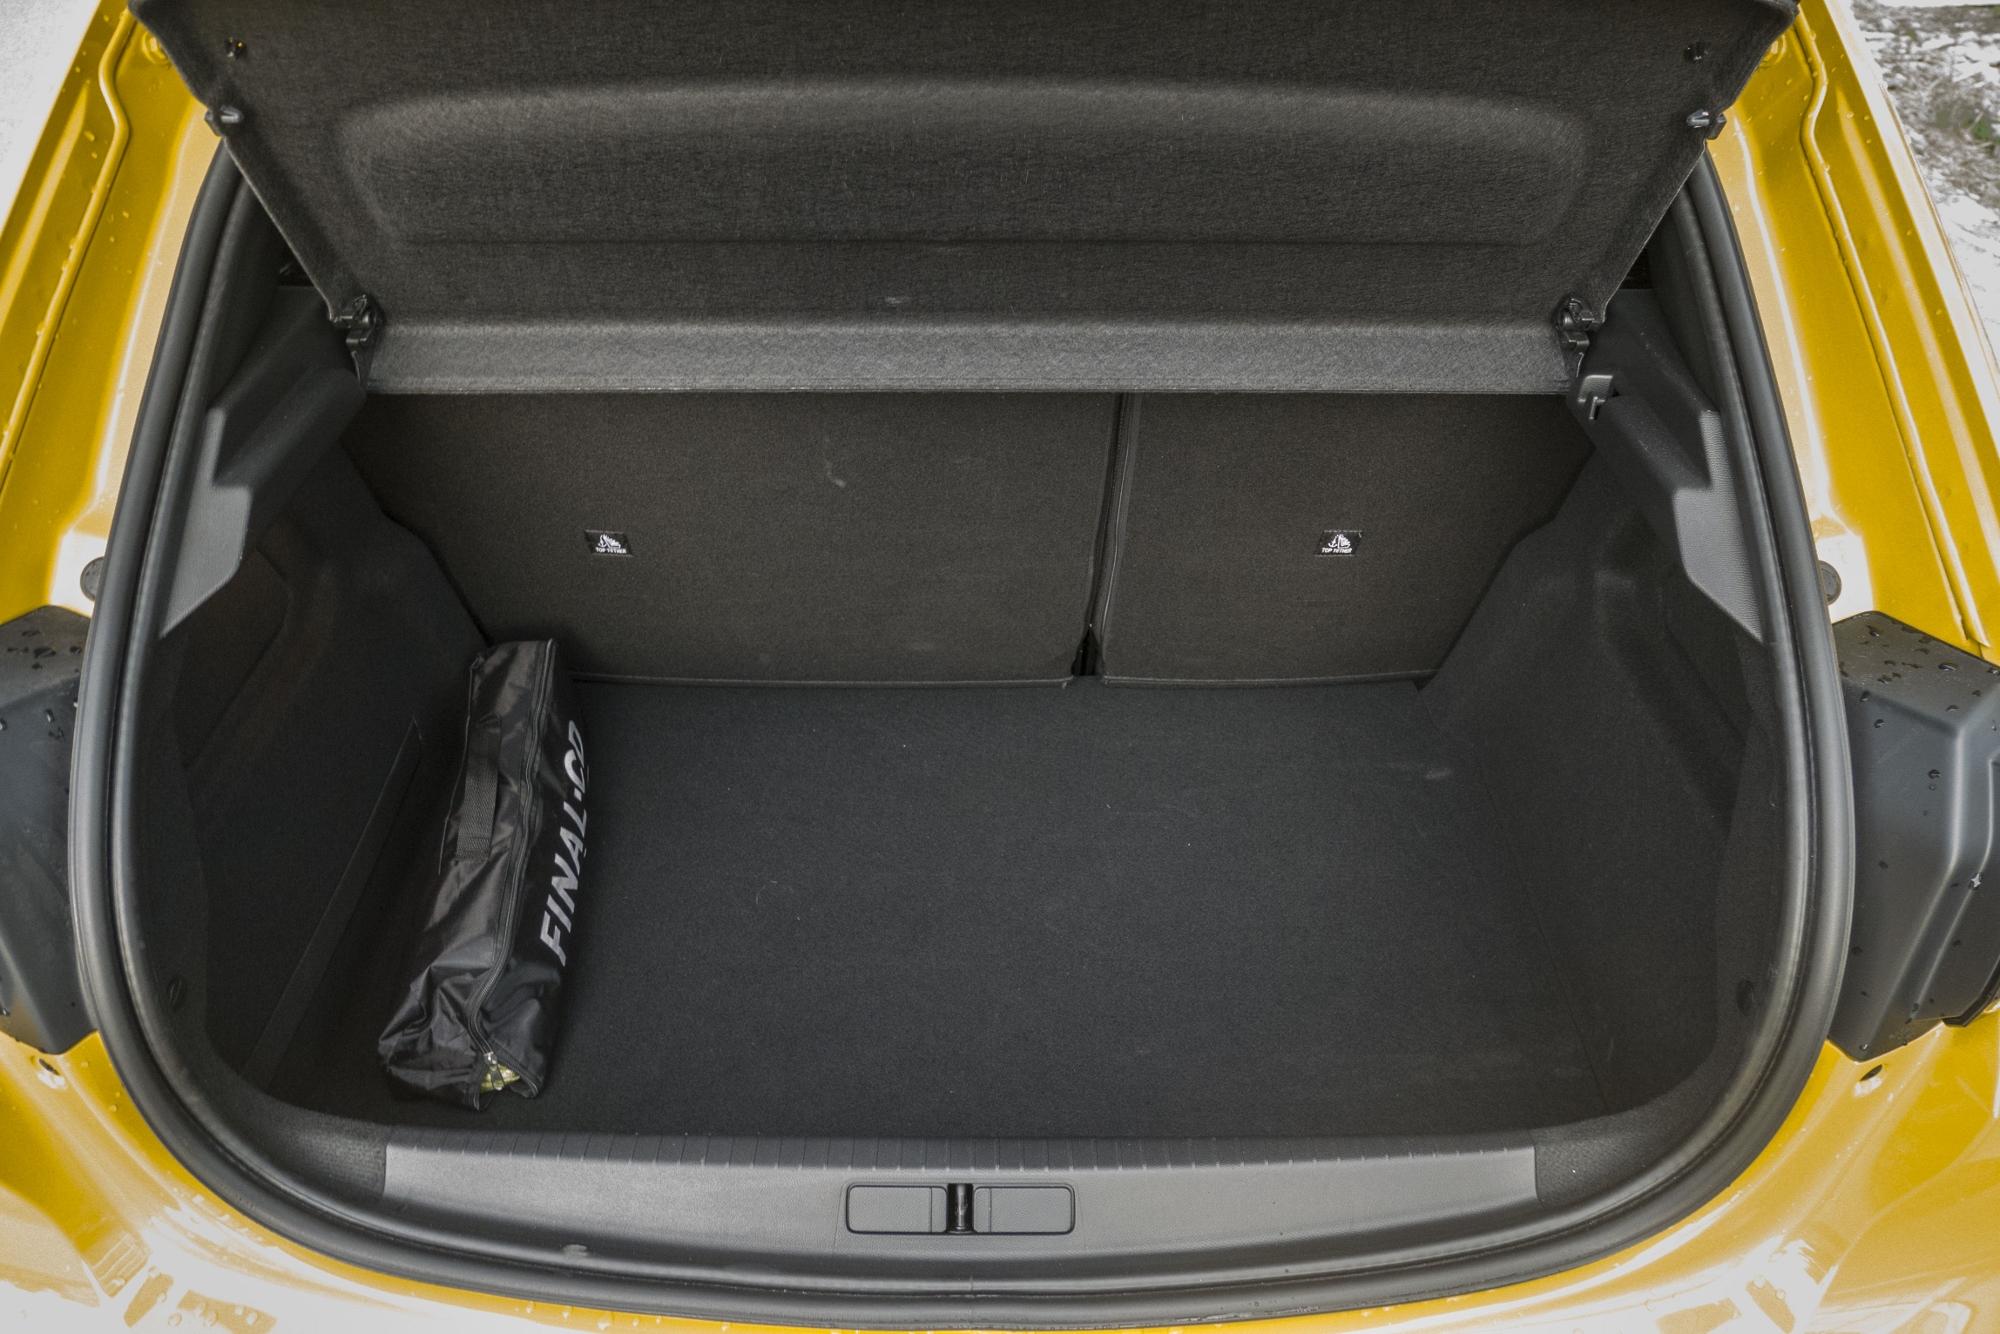 Test: Peugeot 208 prekvapivo pútal pohľady 48oIVbdIBD peugeot-208-21